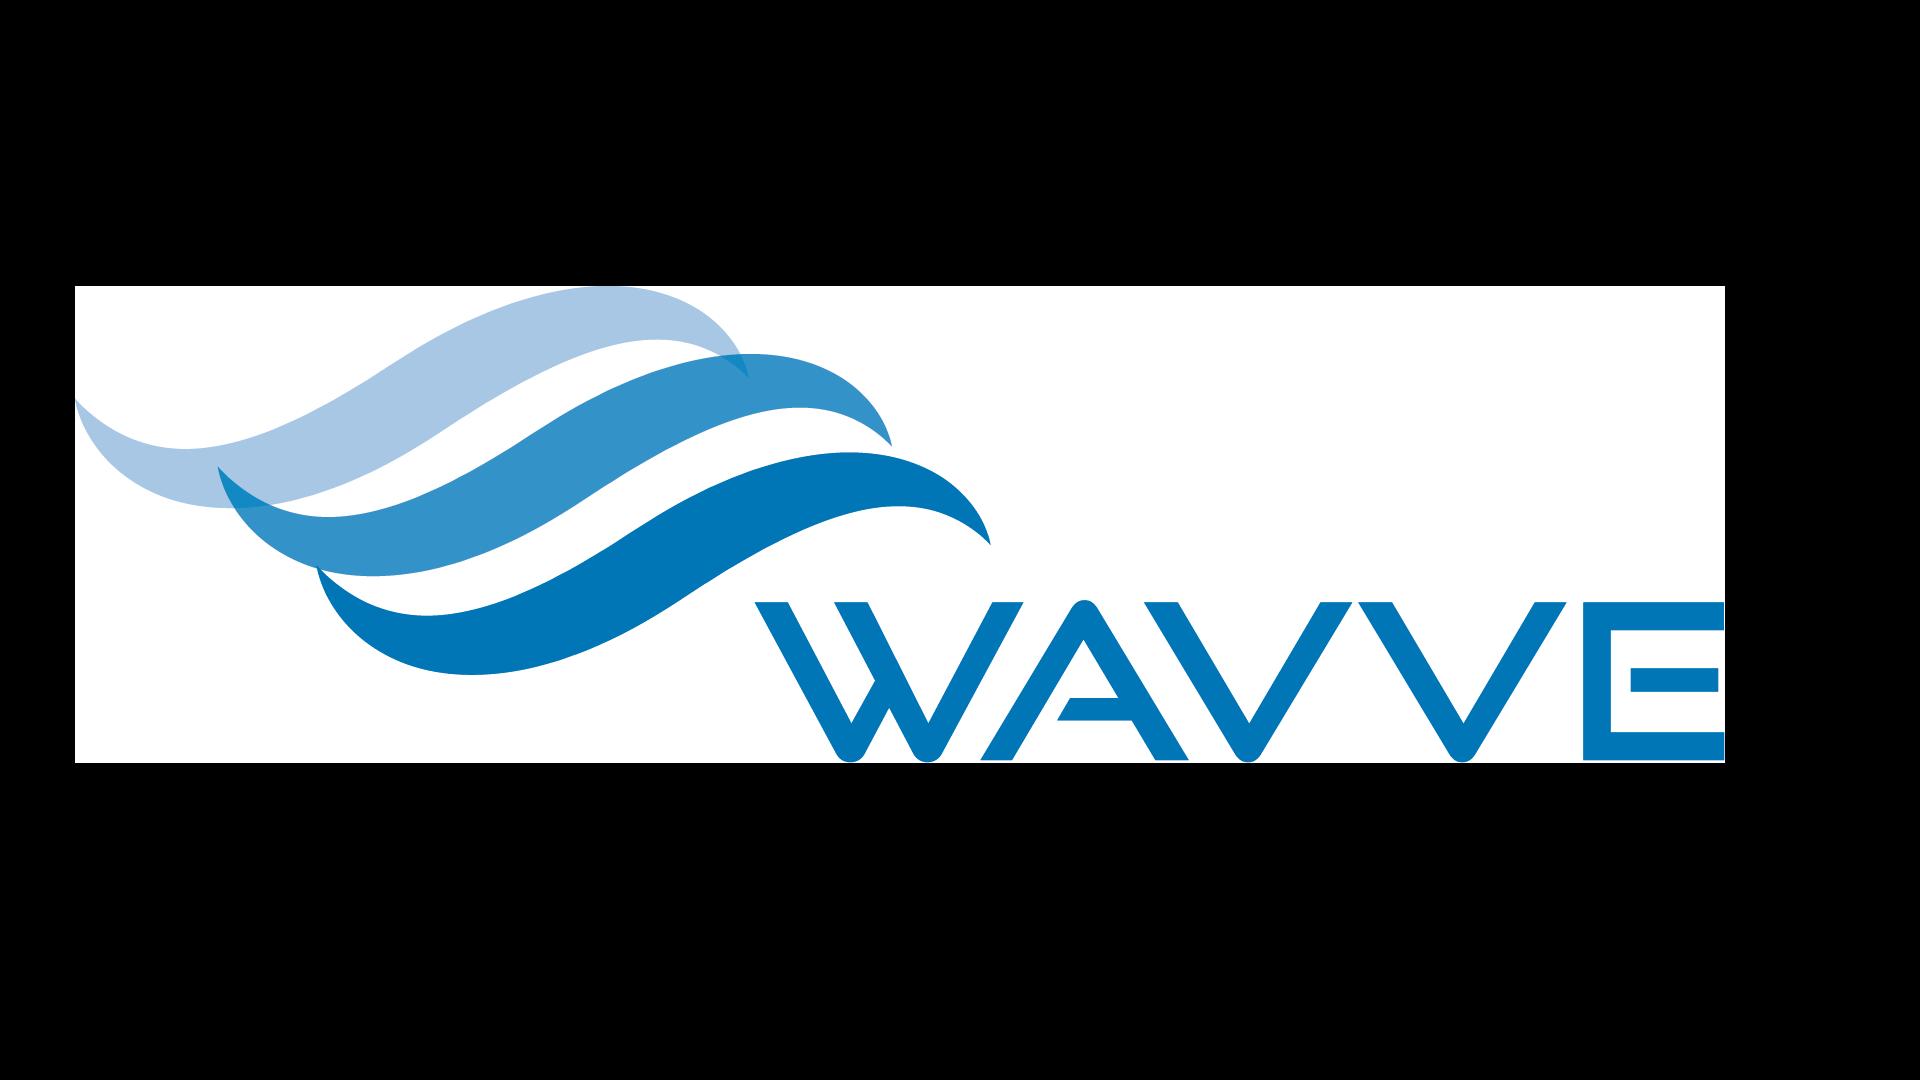 Full_Wavve_Logo.png